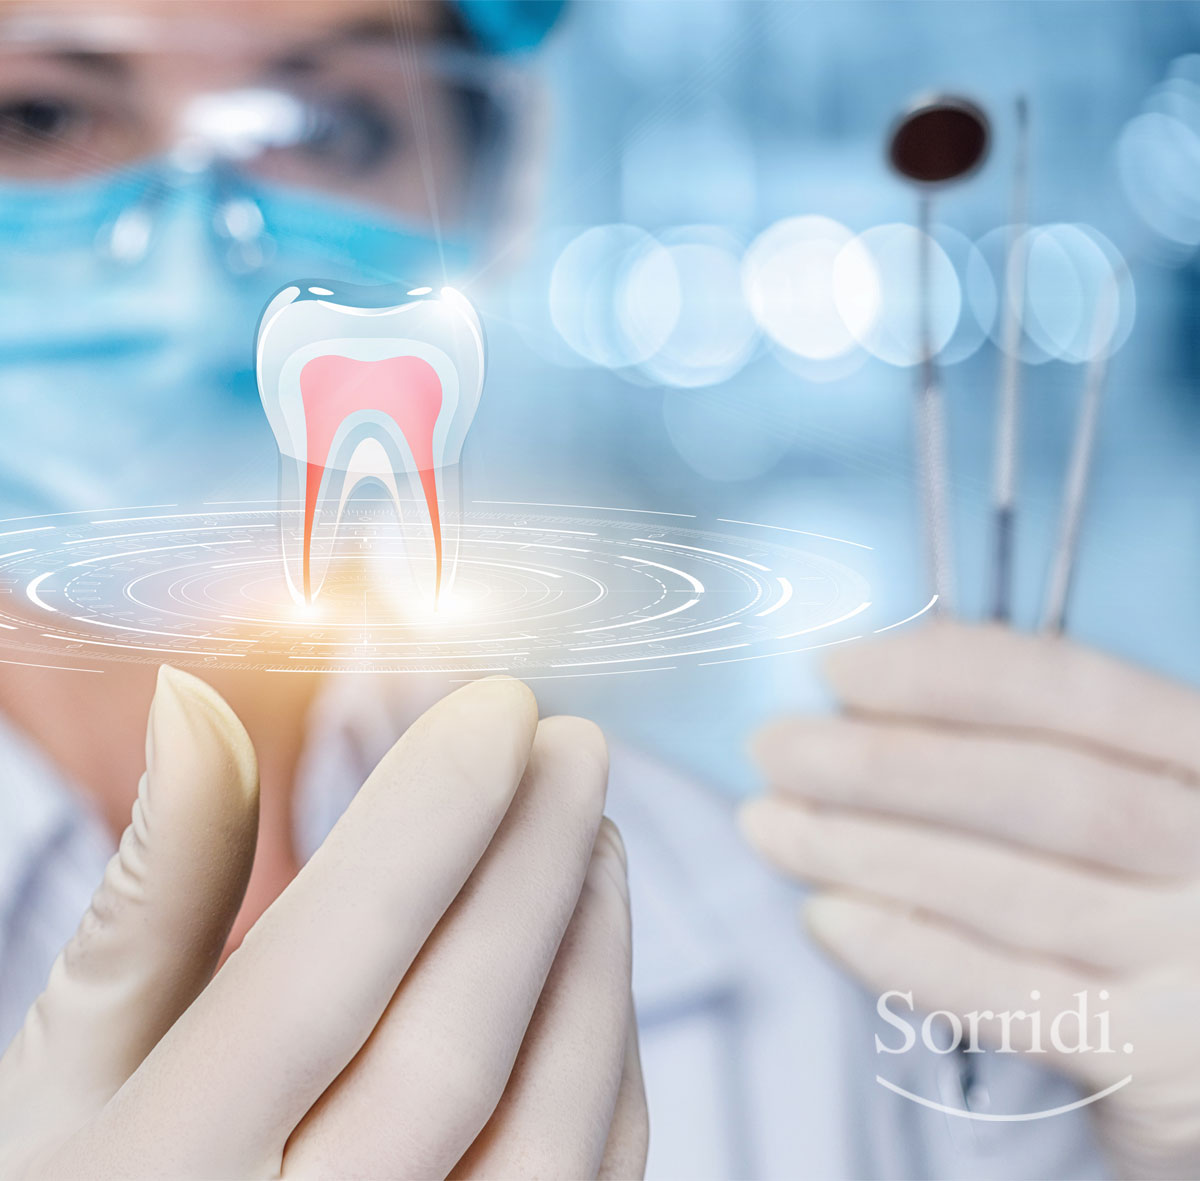 Sorridi-ch-magazine-odontoiatra-e-ortodontista